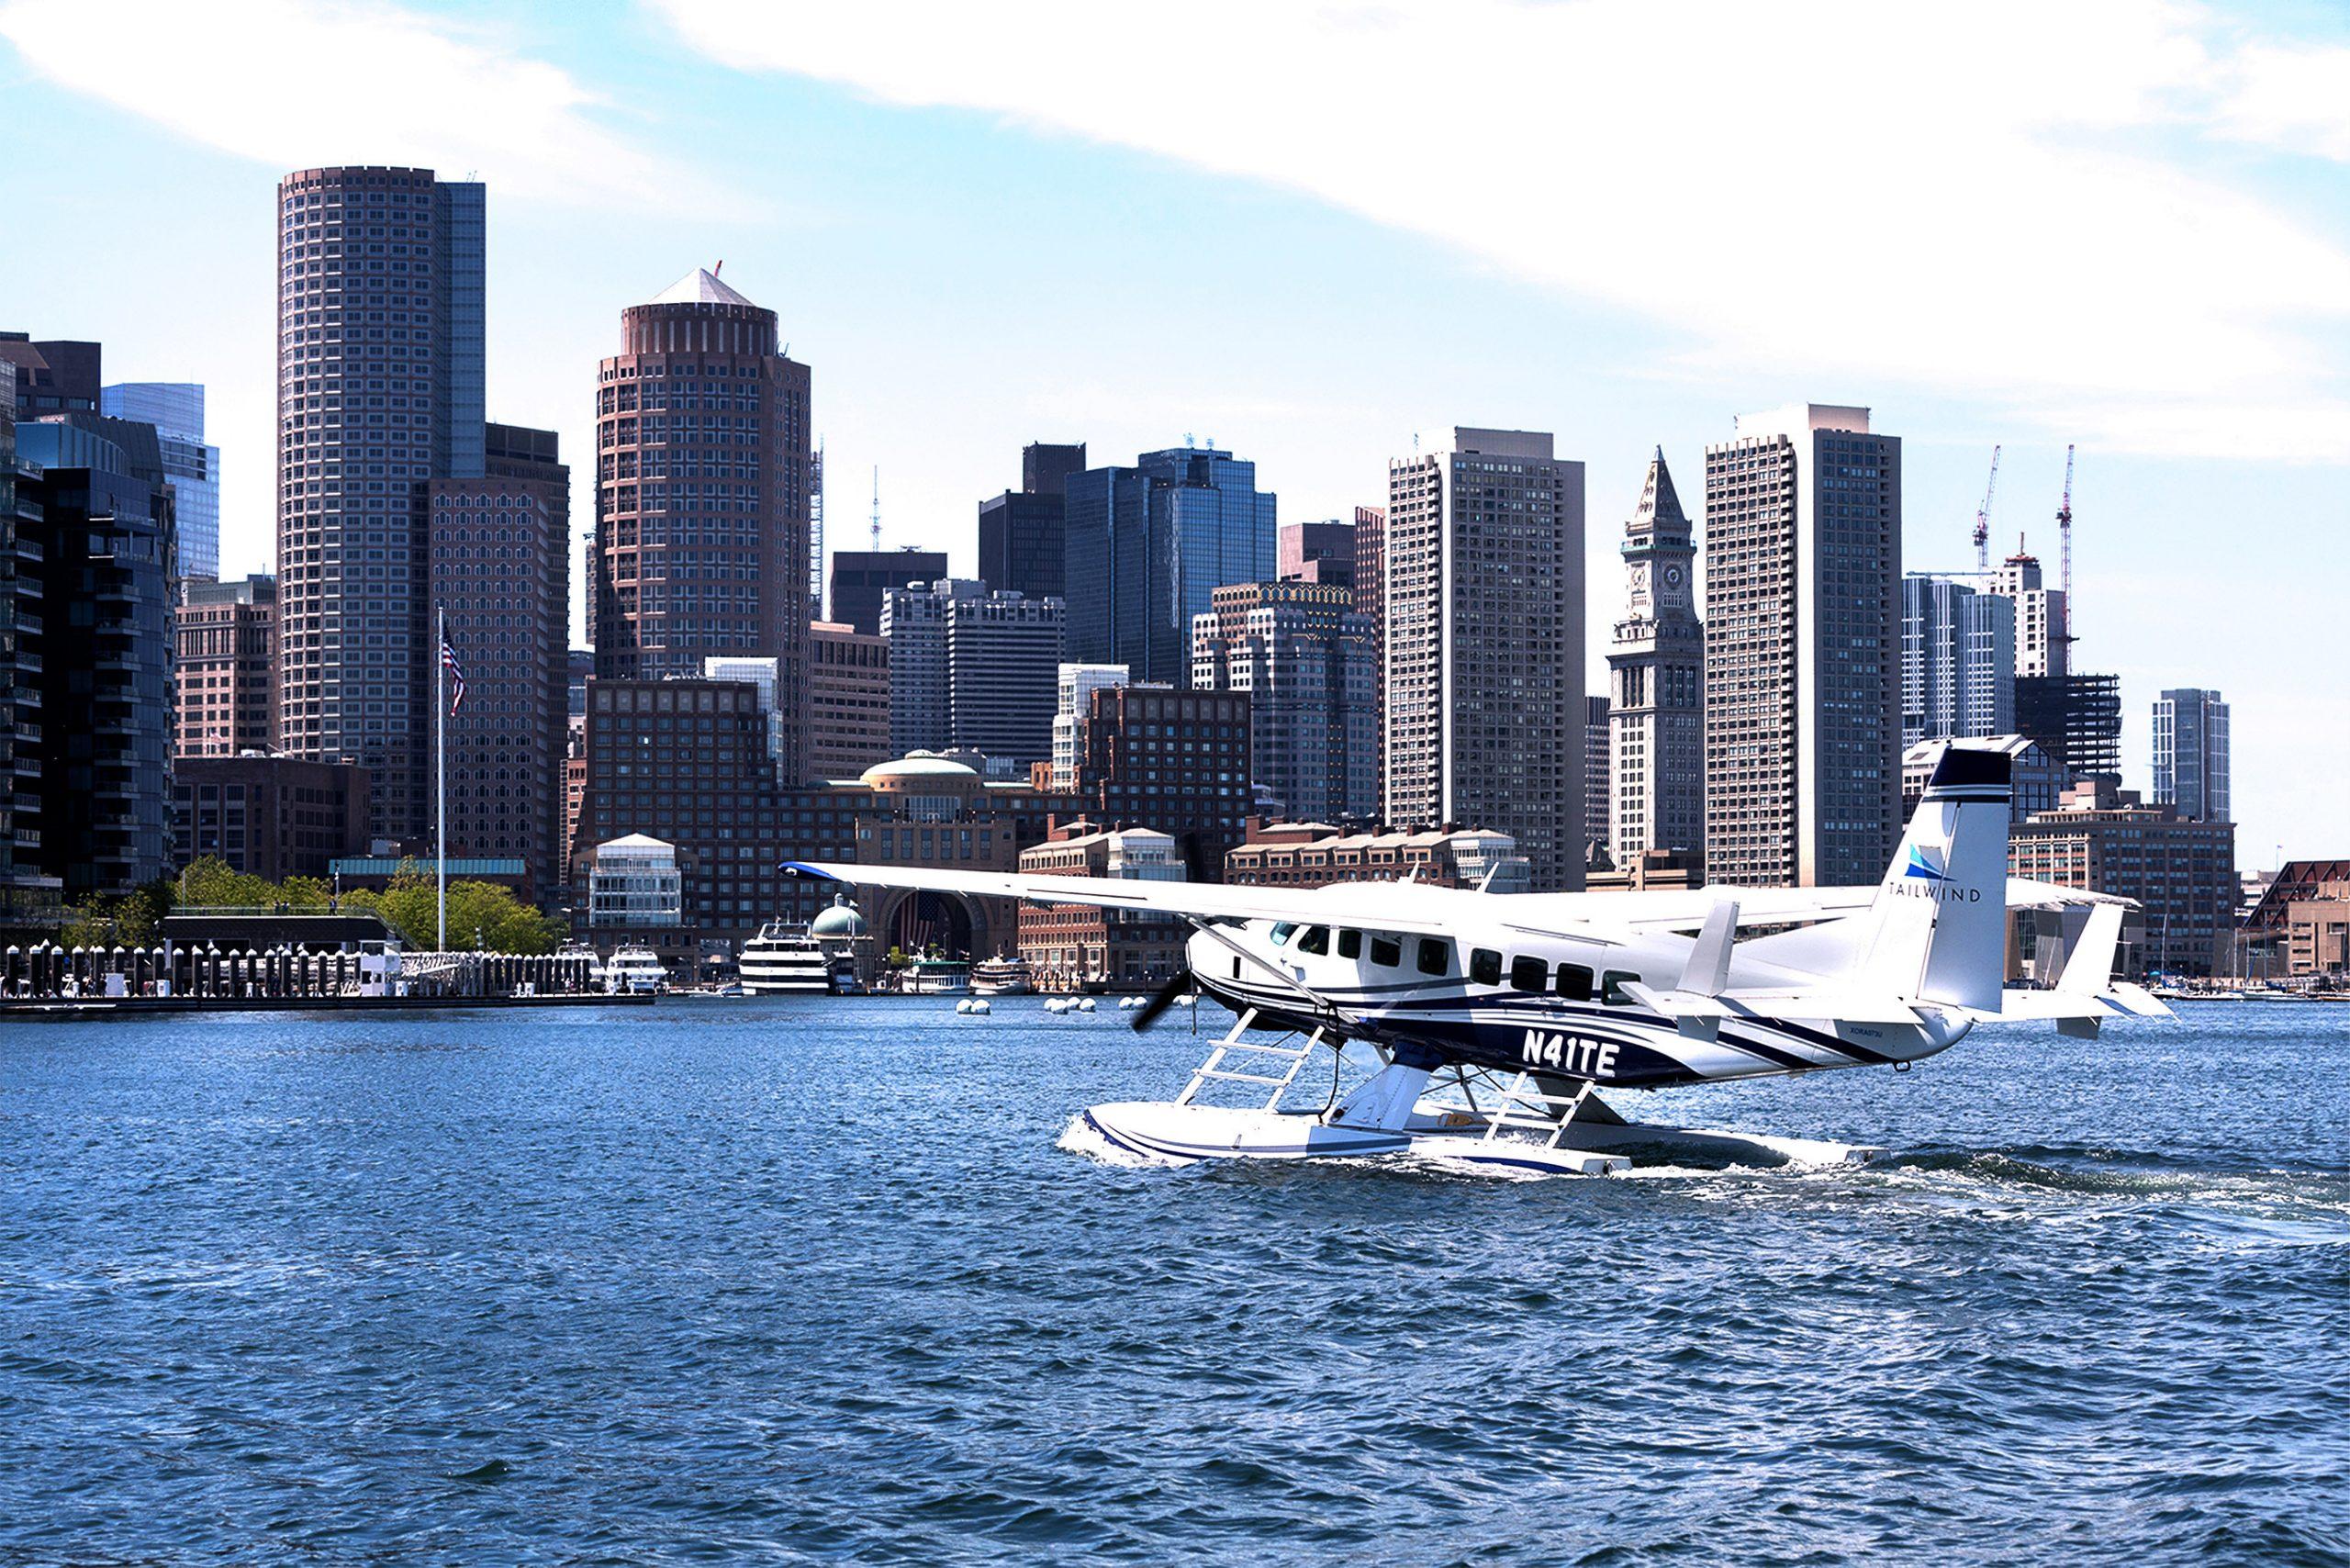 En Cessna Grand Caravan EX fra Tailwind Air i havnen i Boston. Foto: Tailwind Air